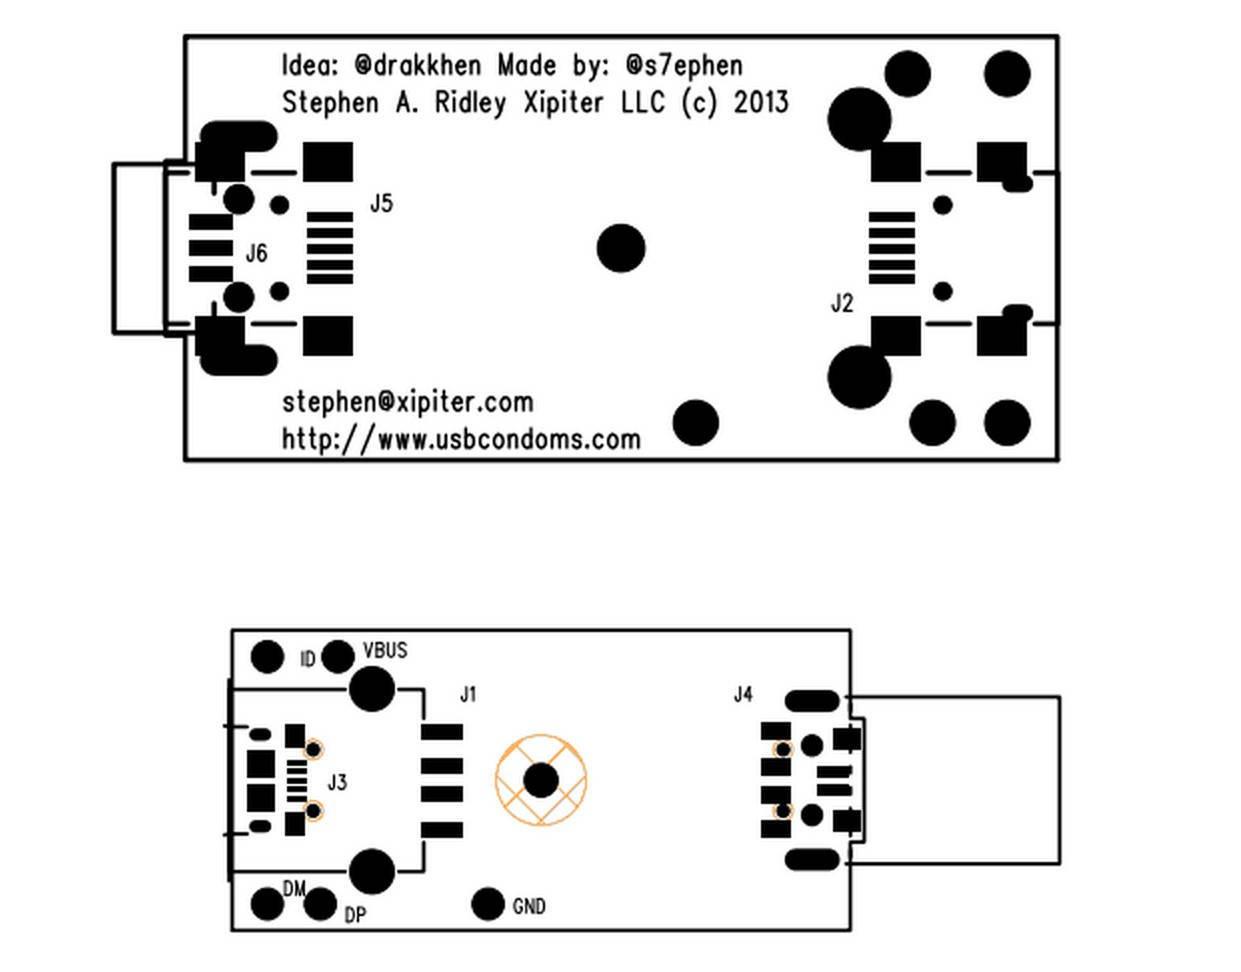 The design of the USB Condom